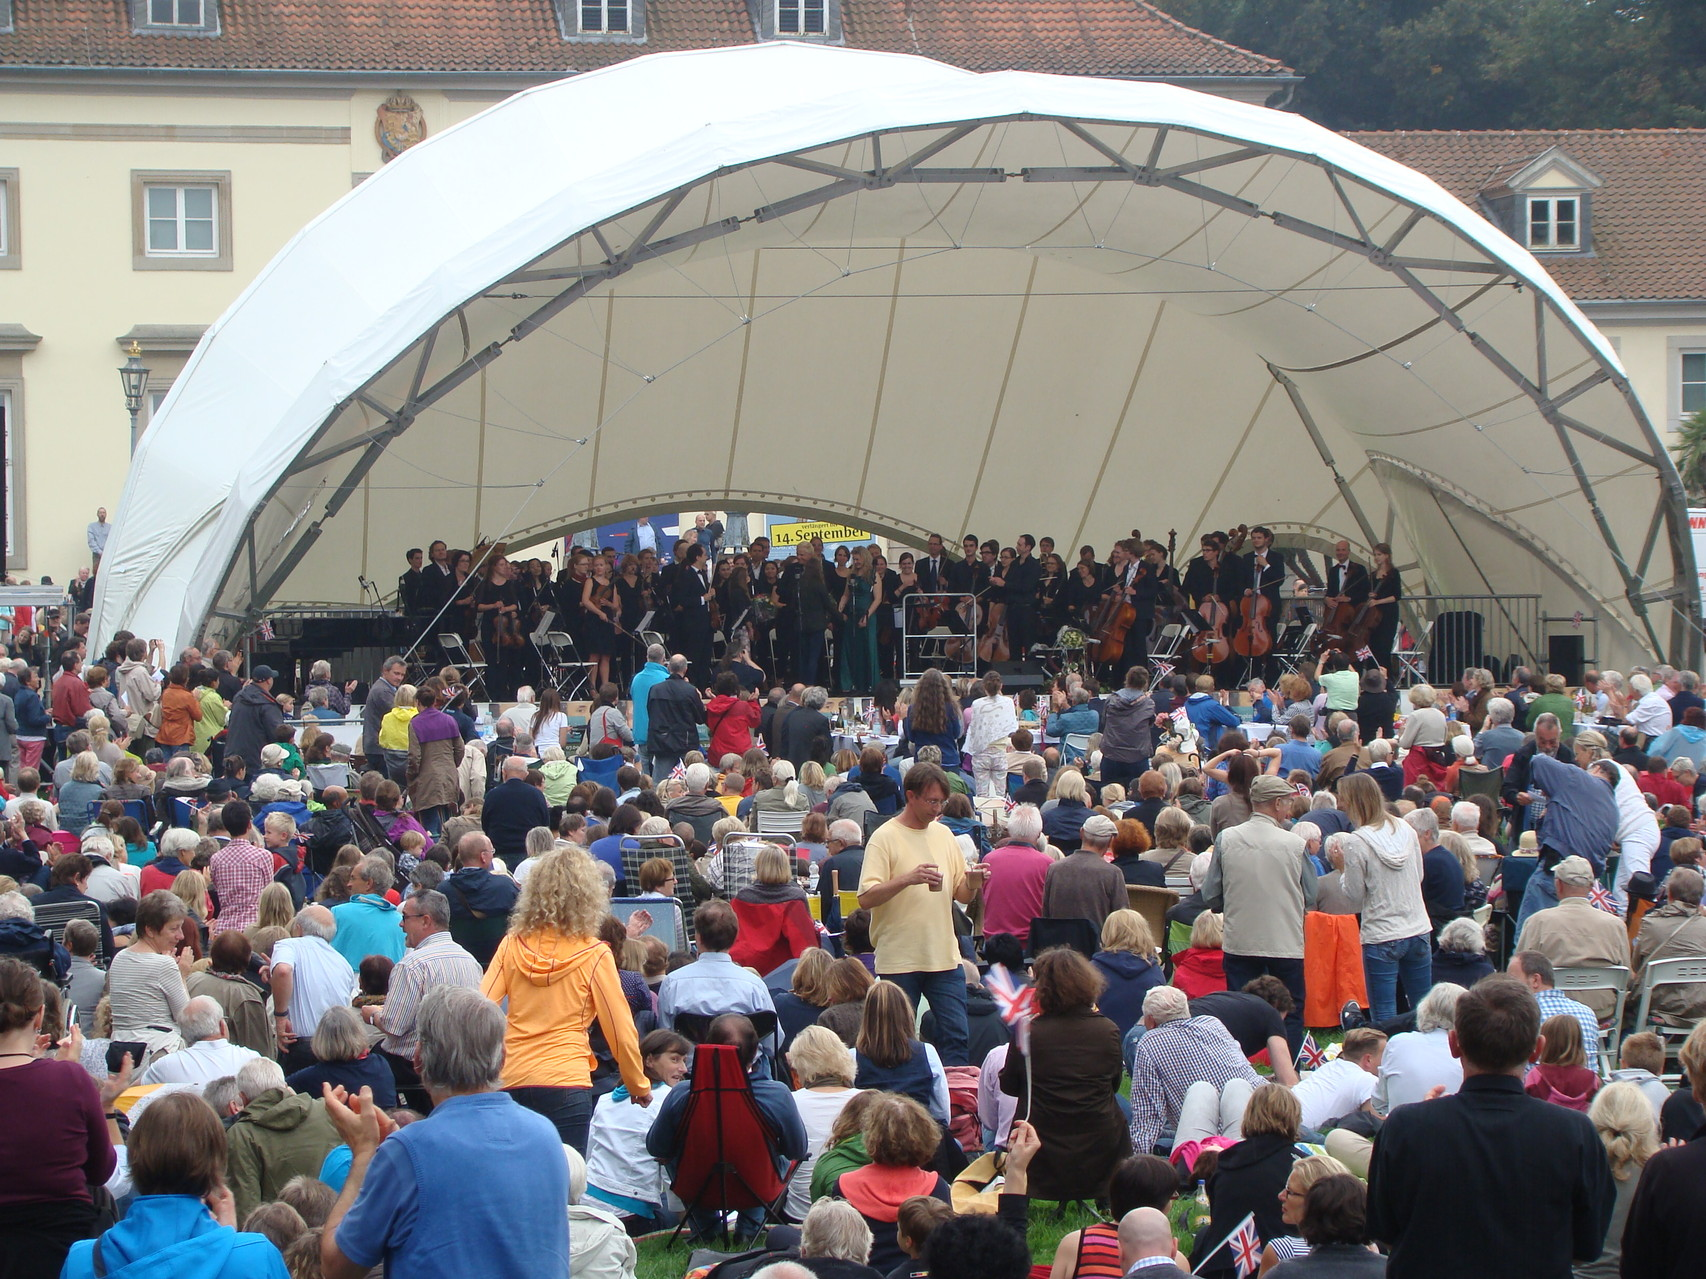 Orchester Open Air, Klassik Open Air, Georgengarten Hannover, Wilhelm Busch Museum